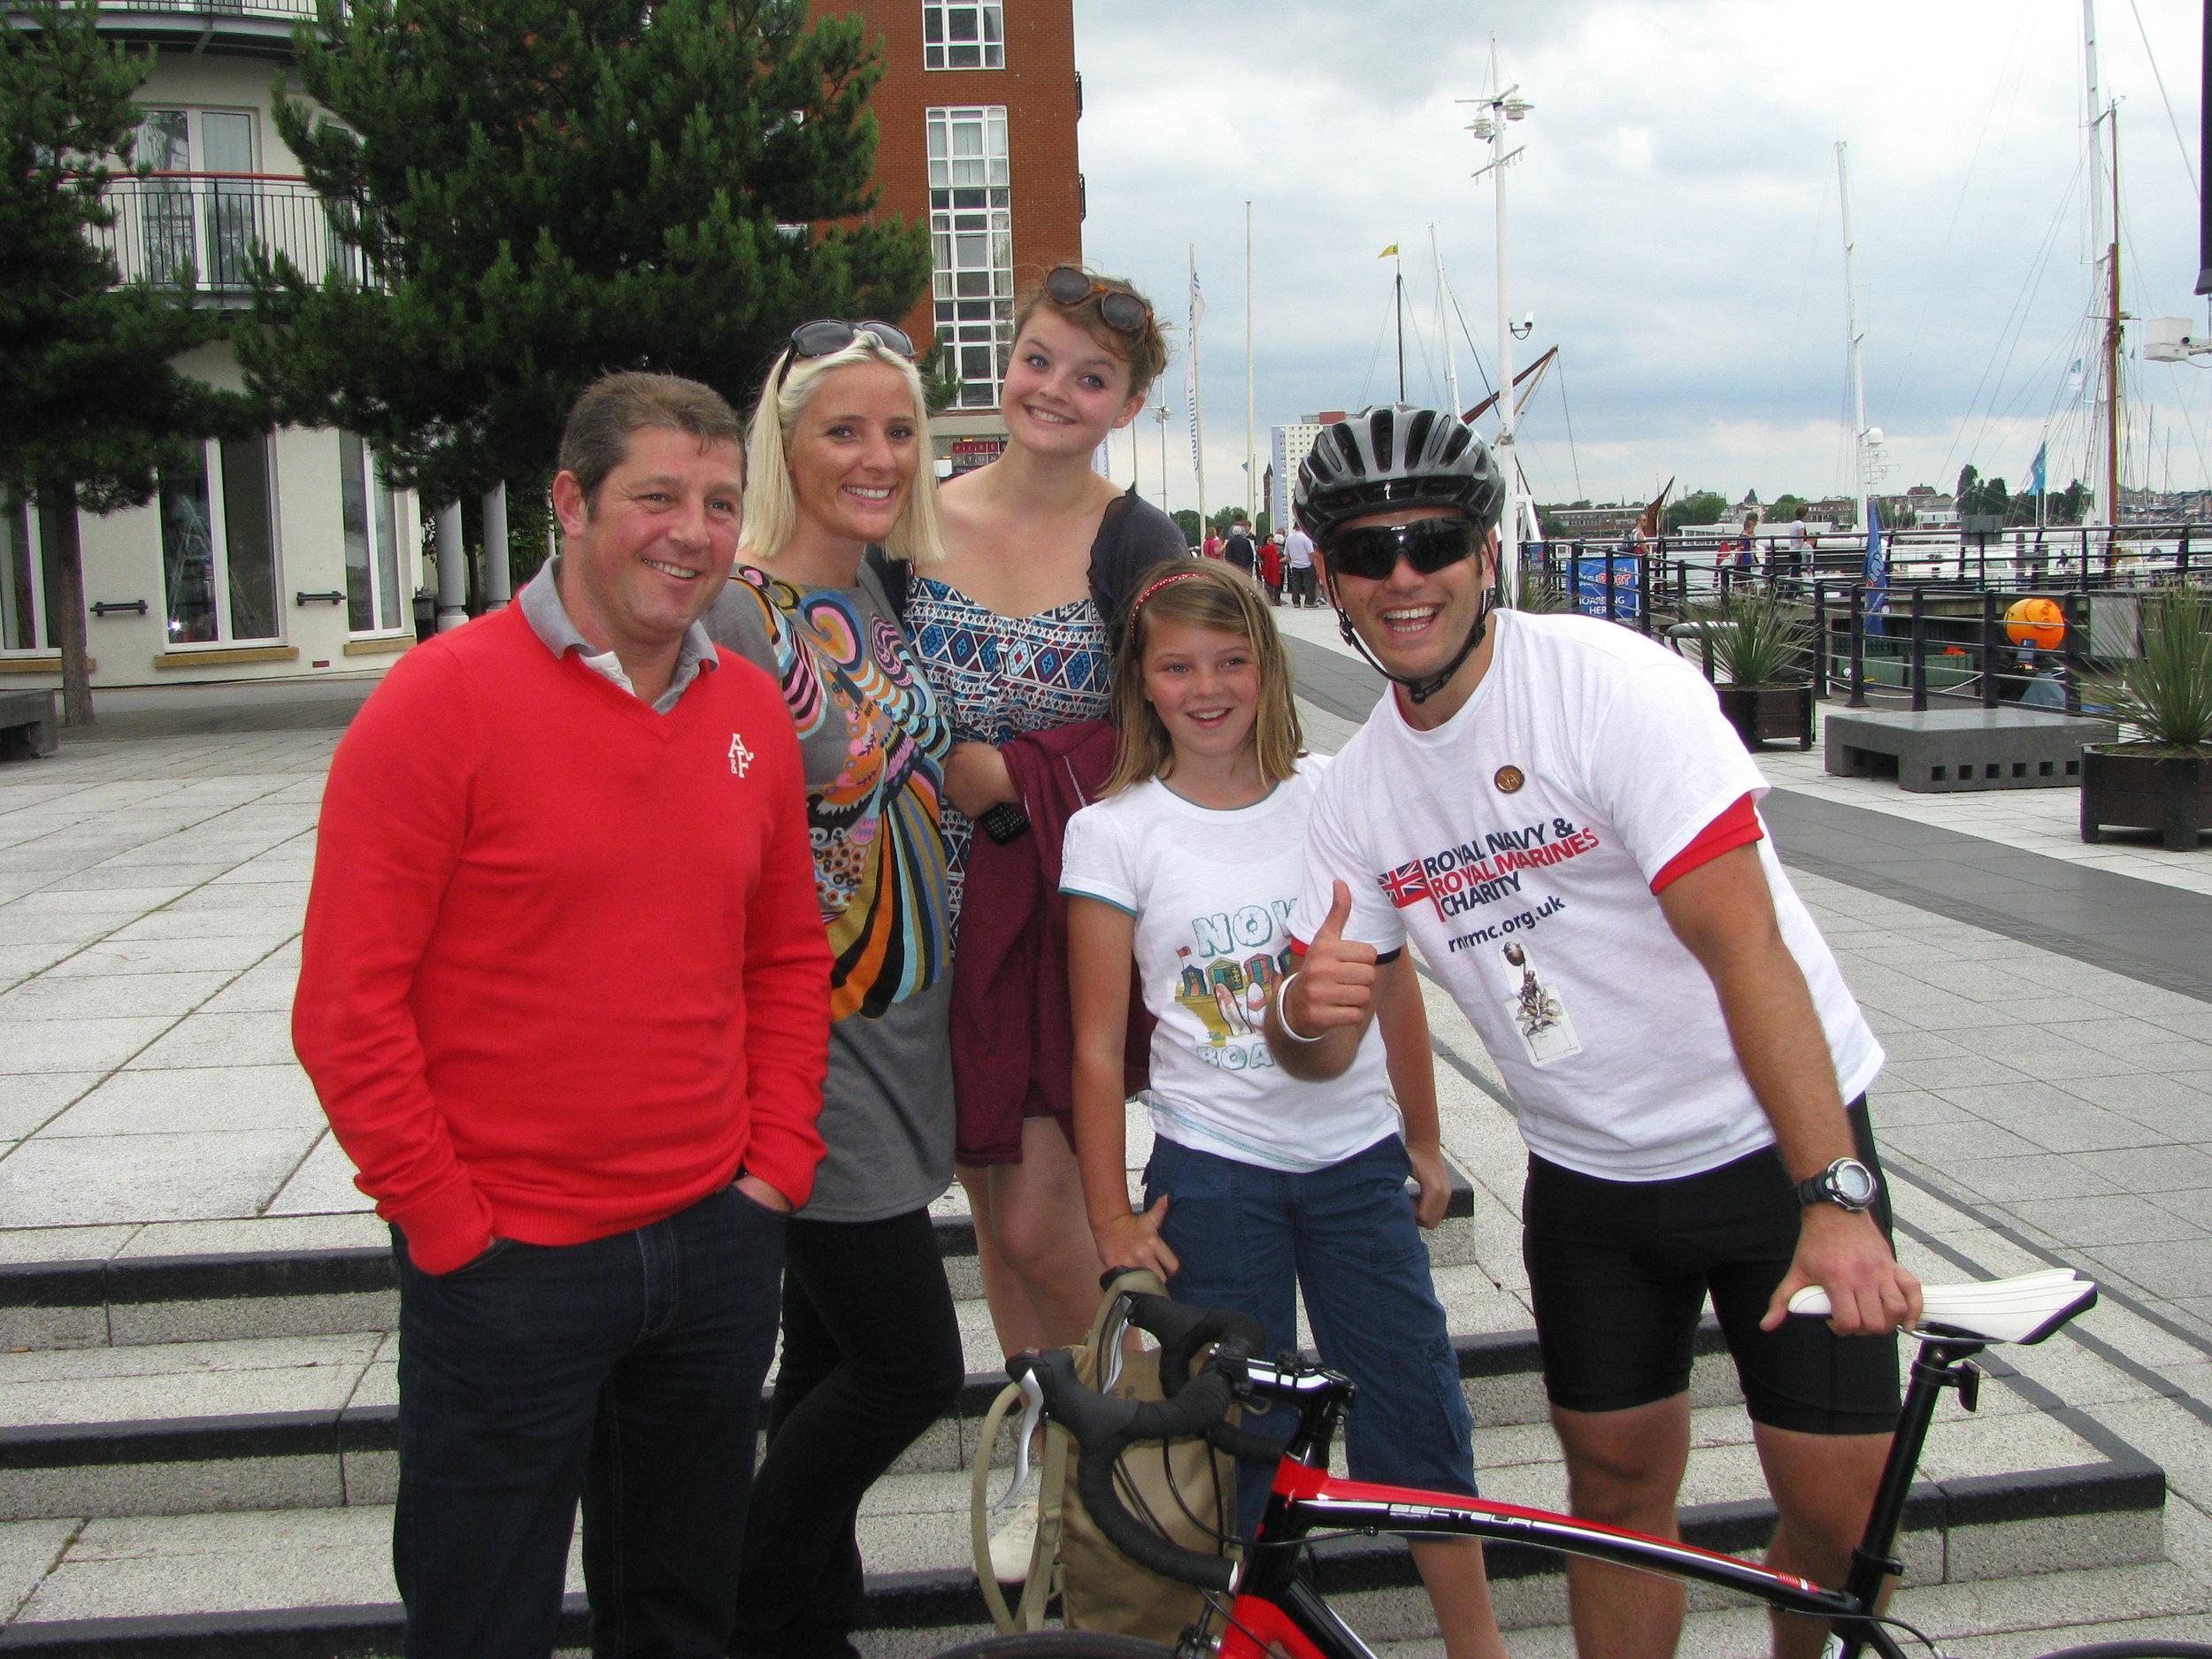 27 July 2011 MW Charity Riders arrive at Gunwharf Quays 015.jpg